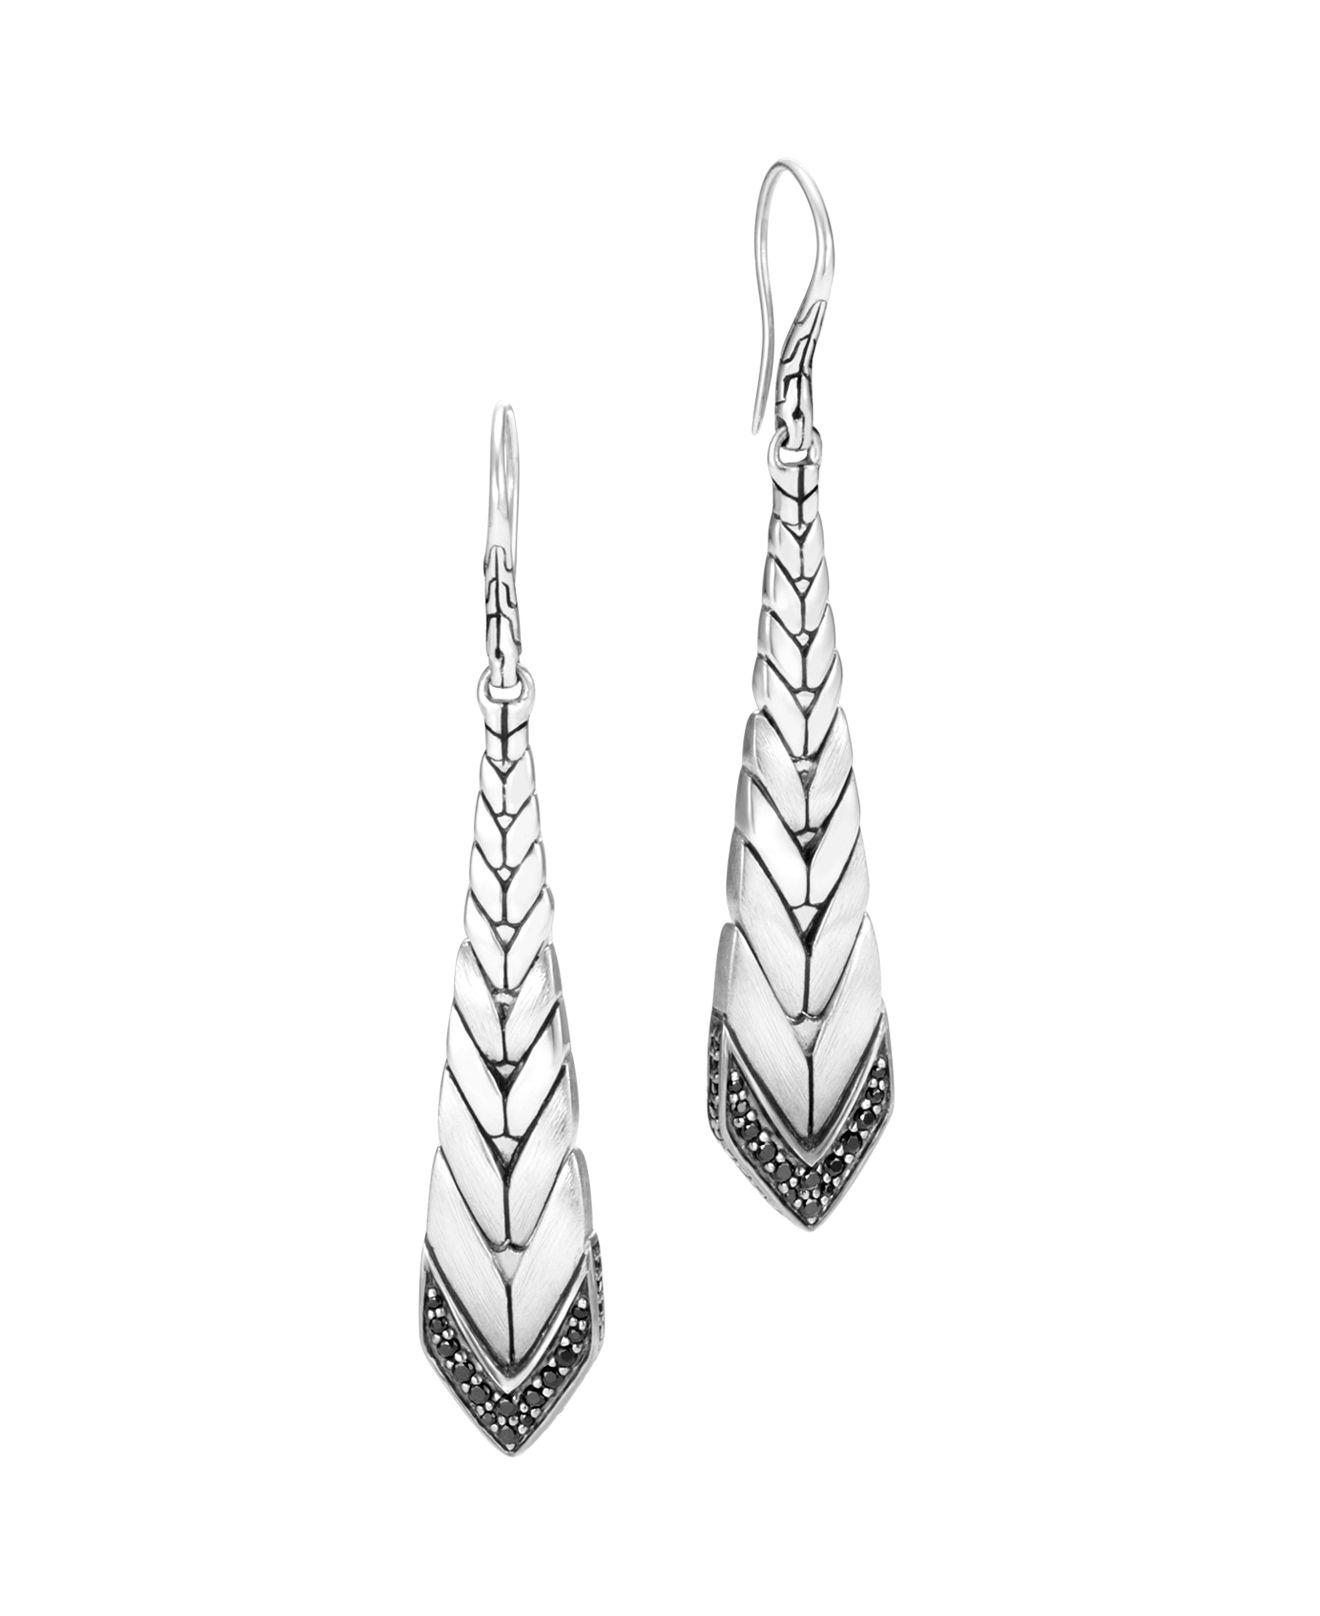 John Hardy Legends Naga Silver Long Drop Earrings with Black Sapphire & Spinel F8pVbuvTgJ